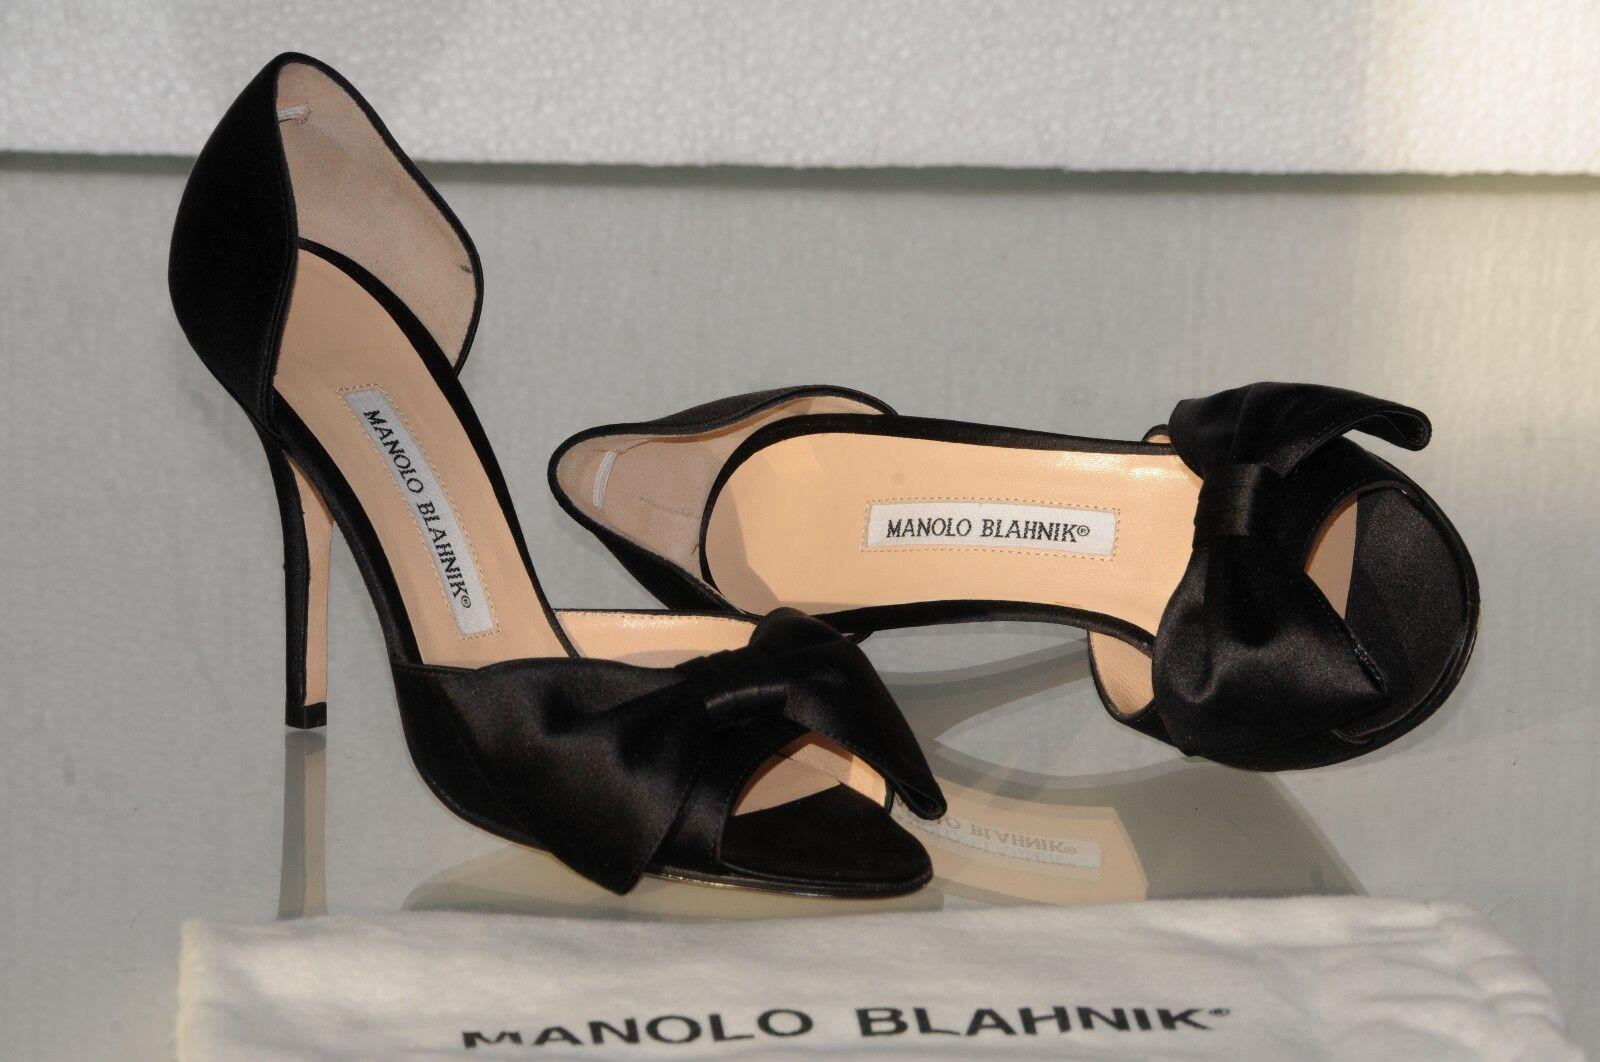 775 New MANOLO BLAHNIK CLAUSADO BOW BLACK SATIN Dorsay Heels SHOES 36.5 40.5